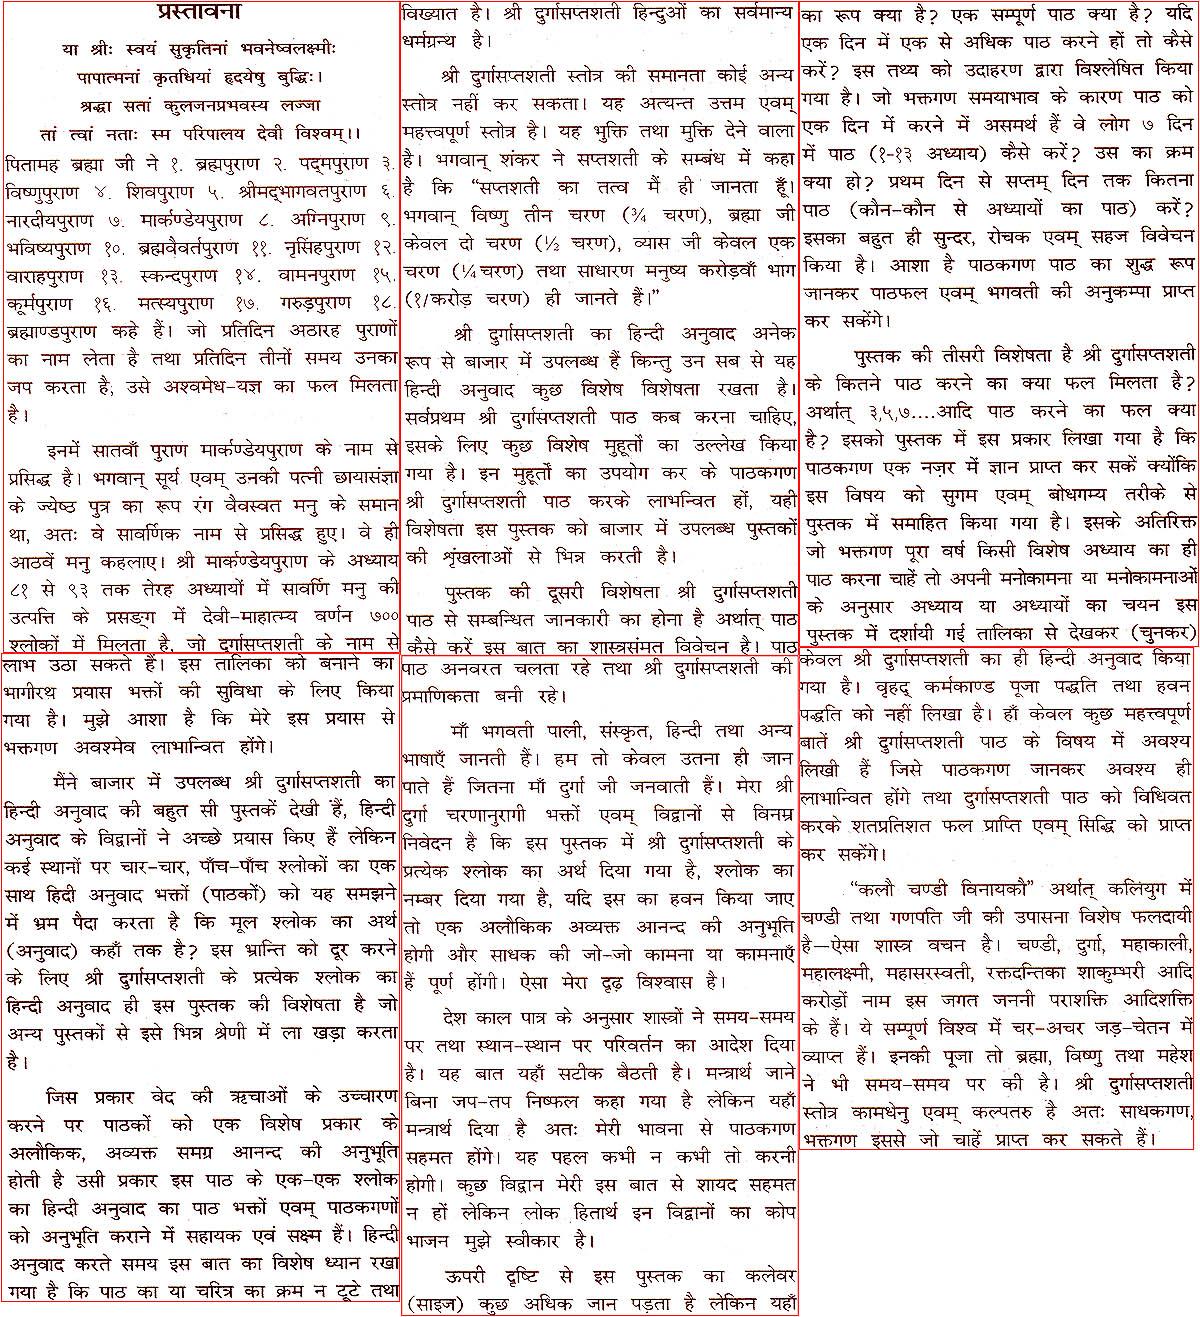 Durga Saptashati Path (hindi - Pdf File)